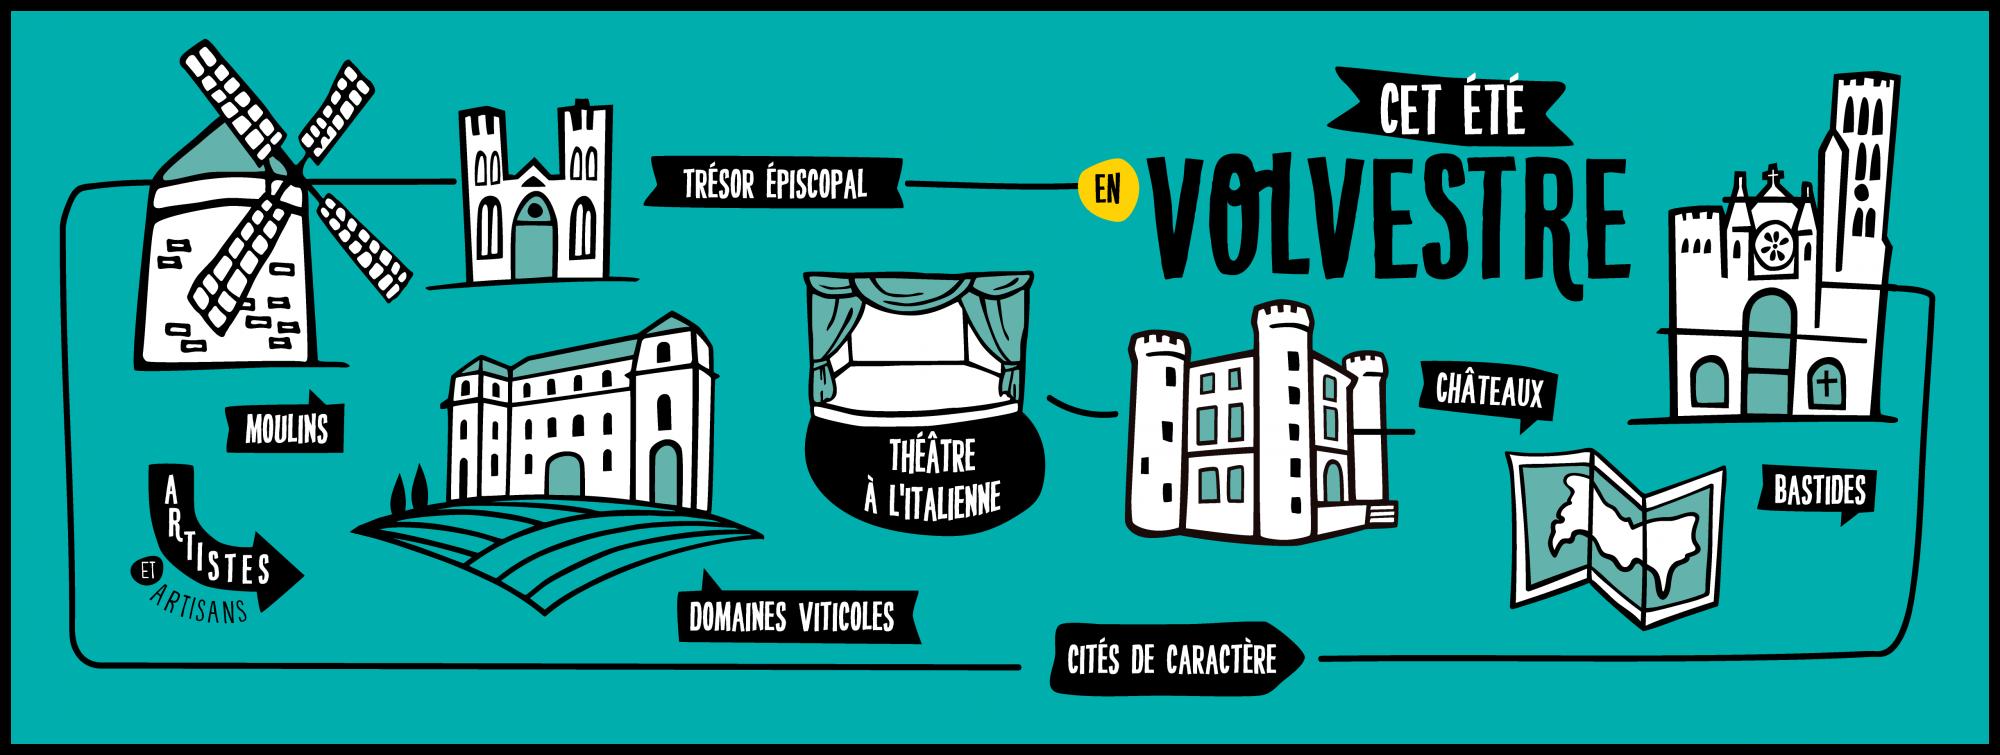 facebookestivales Volvestre1